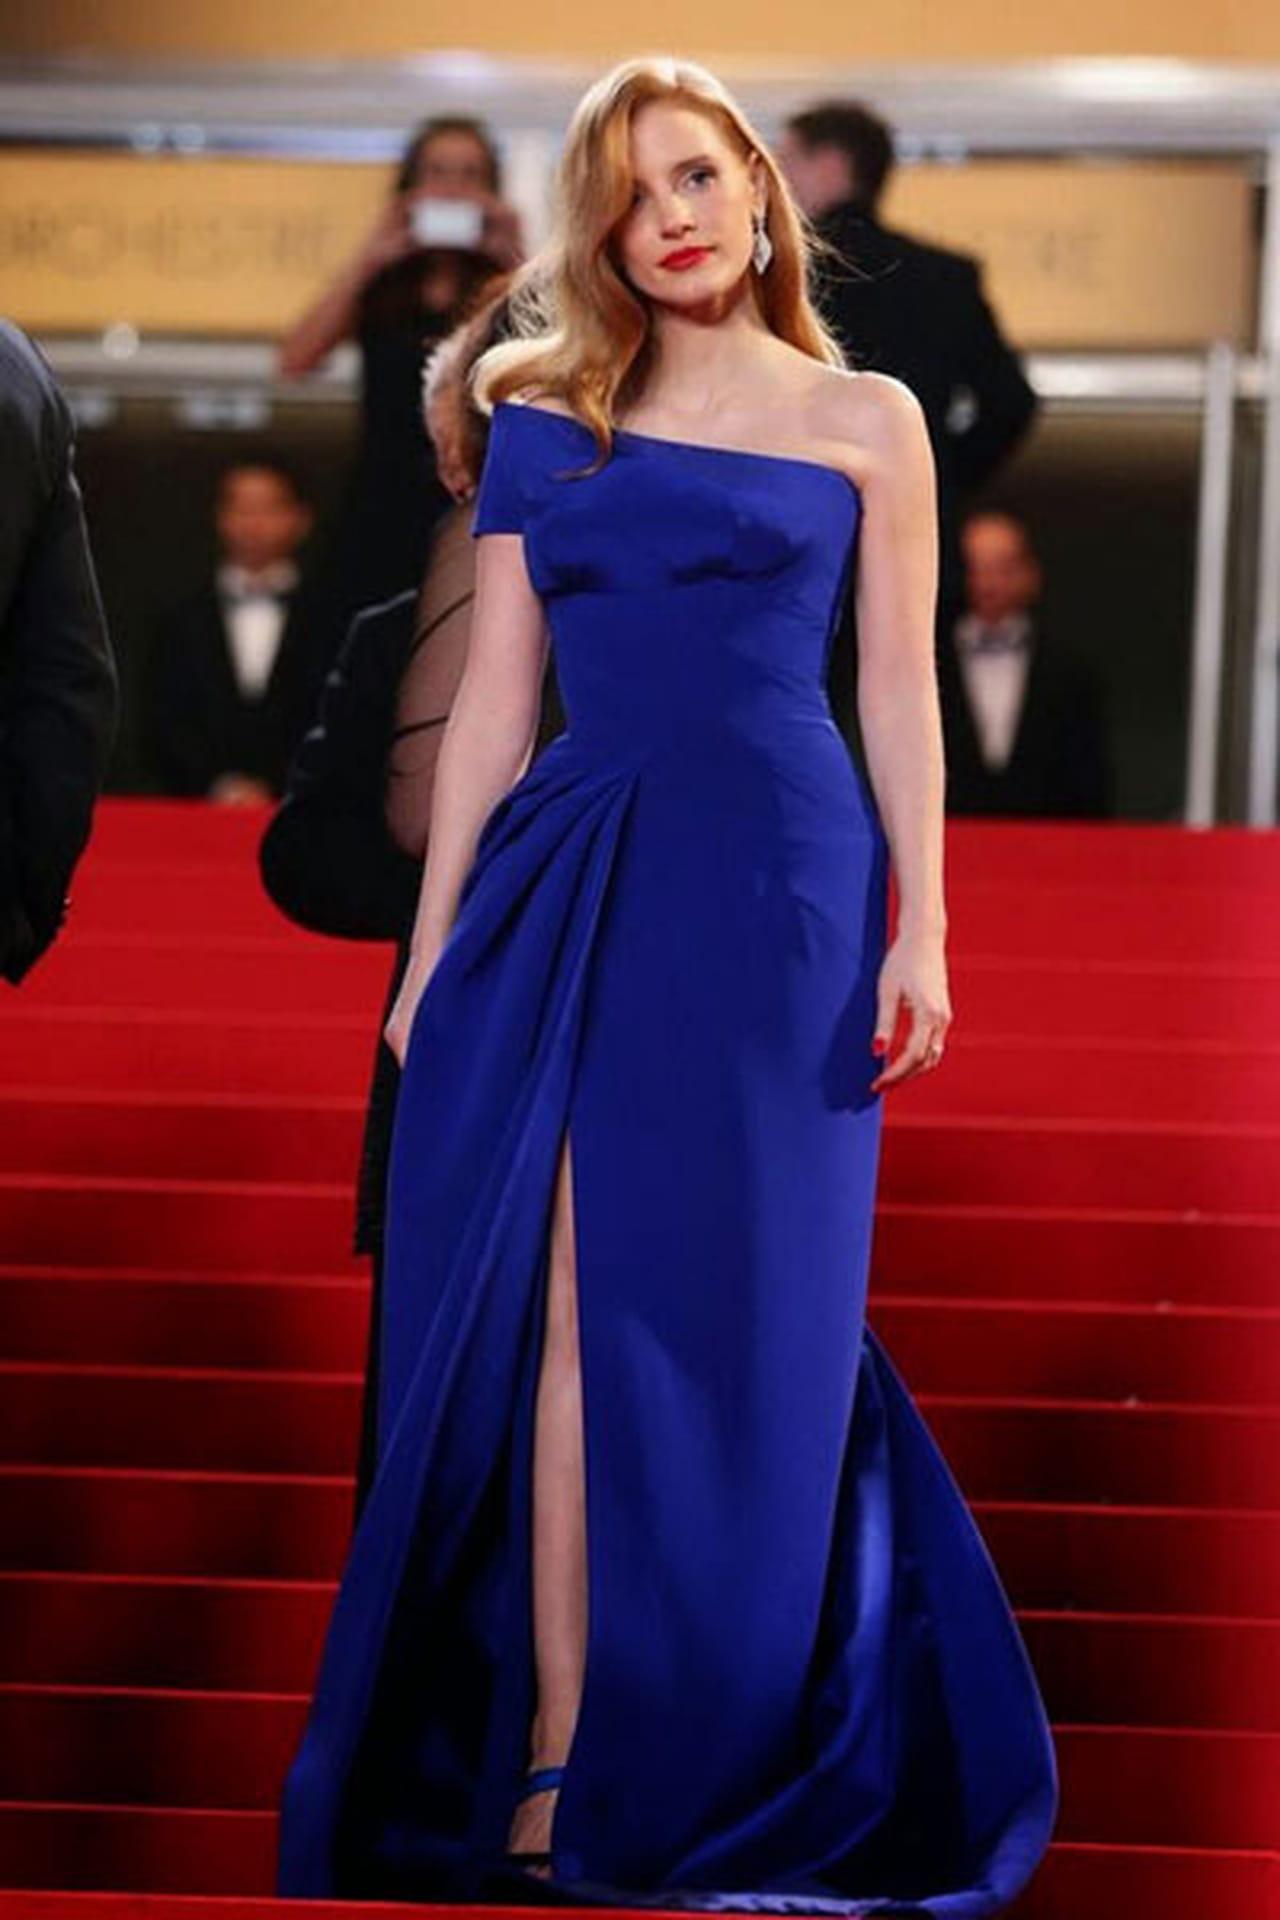 ea7c8f5d3 جيسيكا كاستان ترتدي فستان من توقيع فيرساتشي Versace